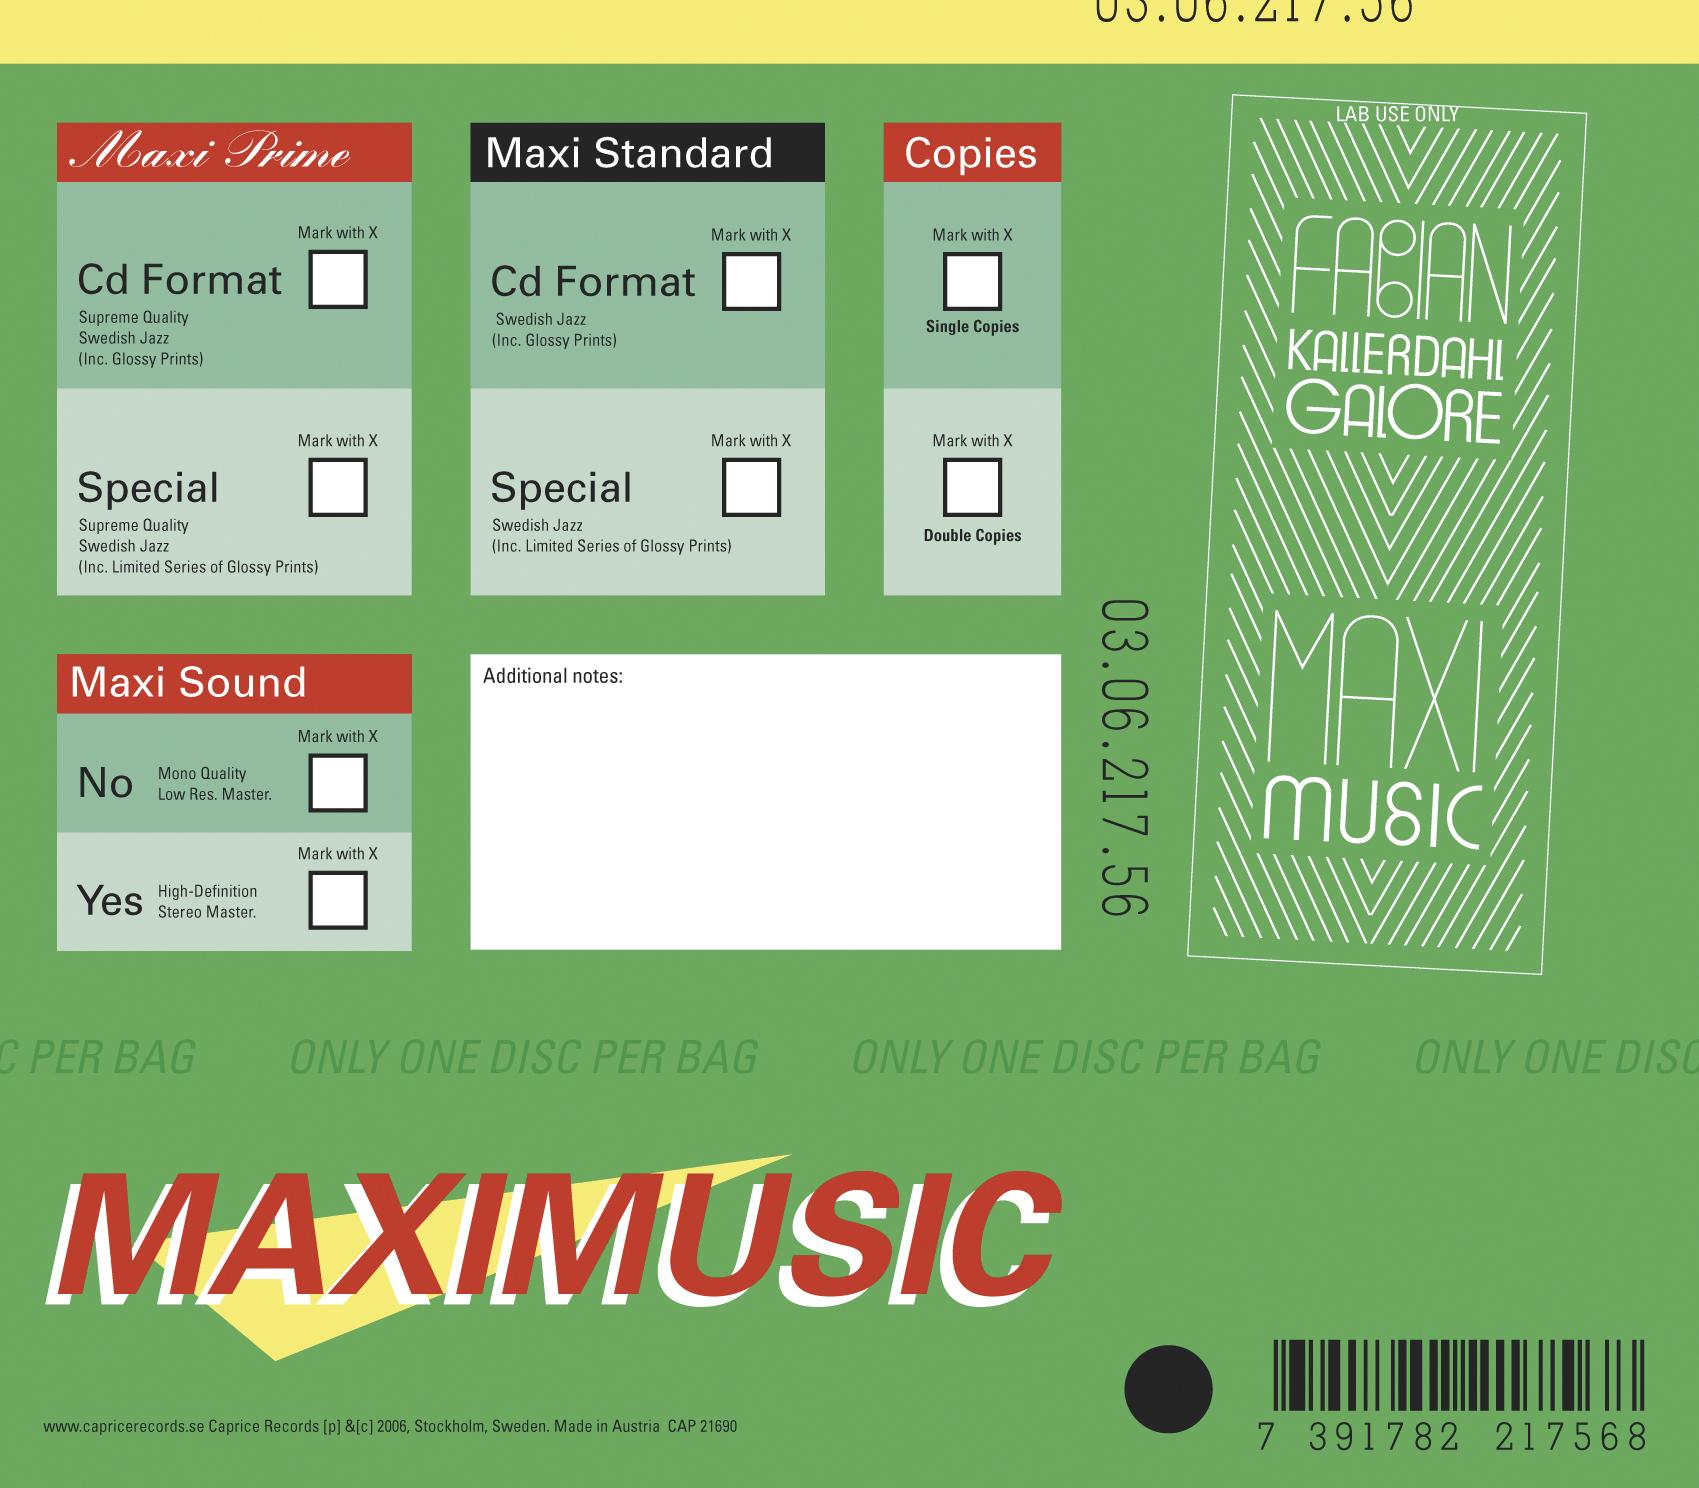 Fabian Kallerdahl Galore: Maxi Music